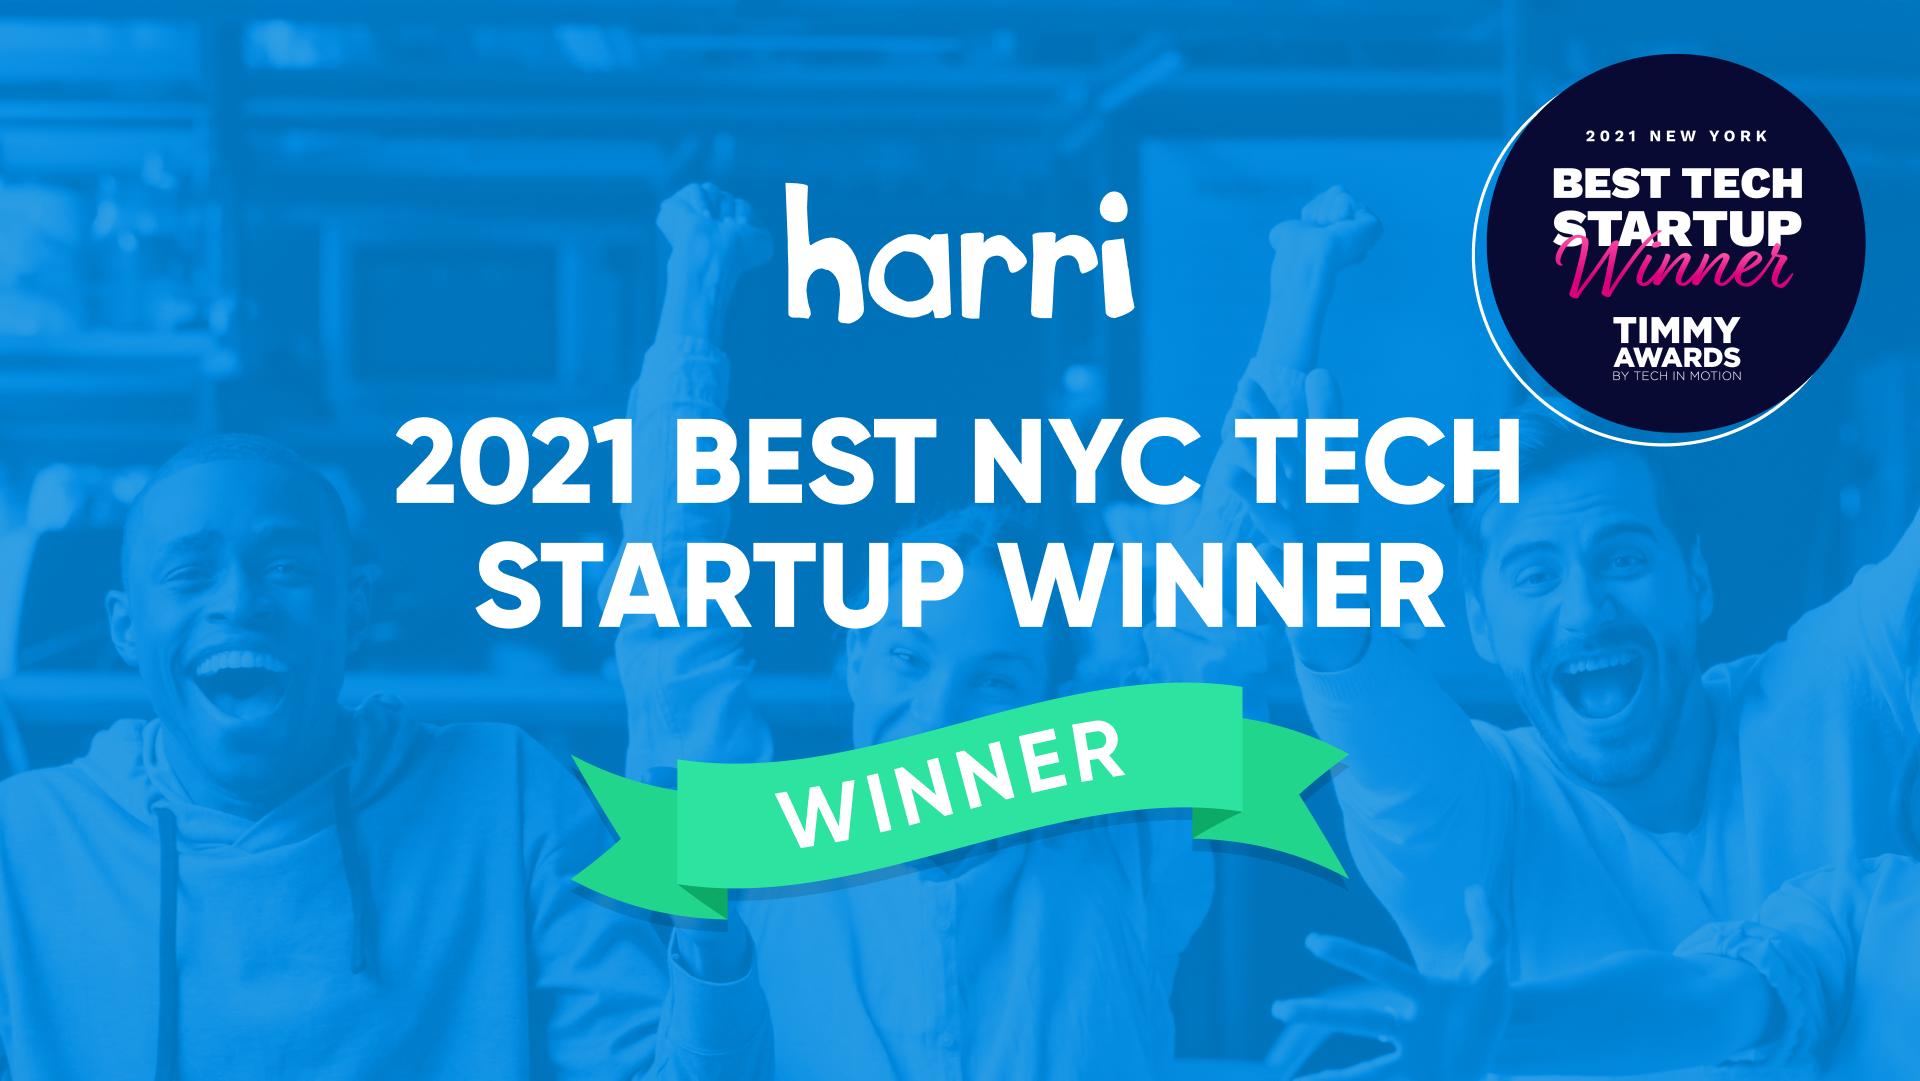 harri nyc timmy awards winner 2021 best tech startup